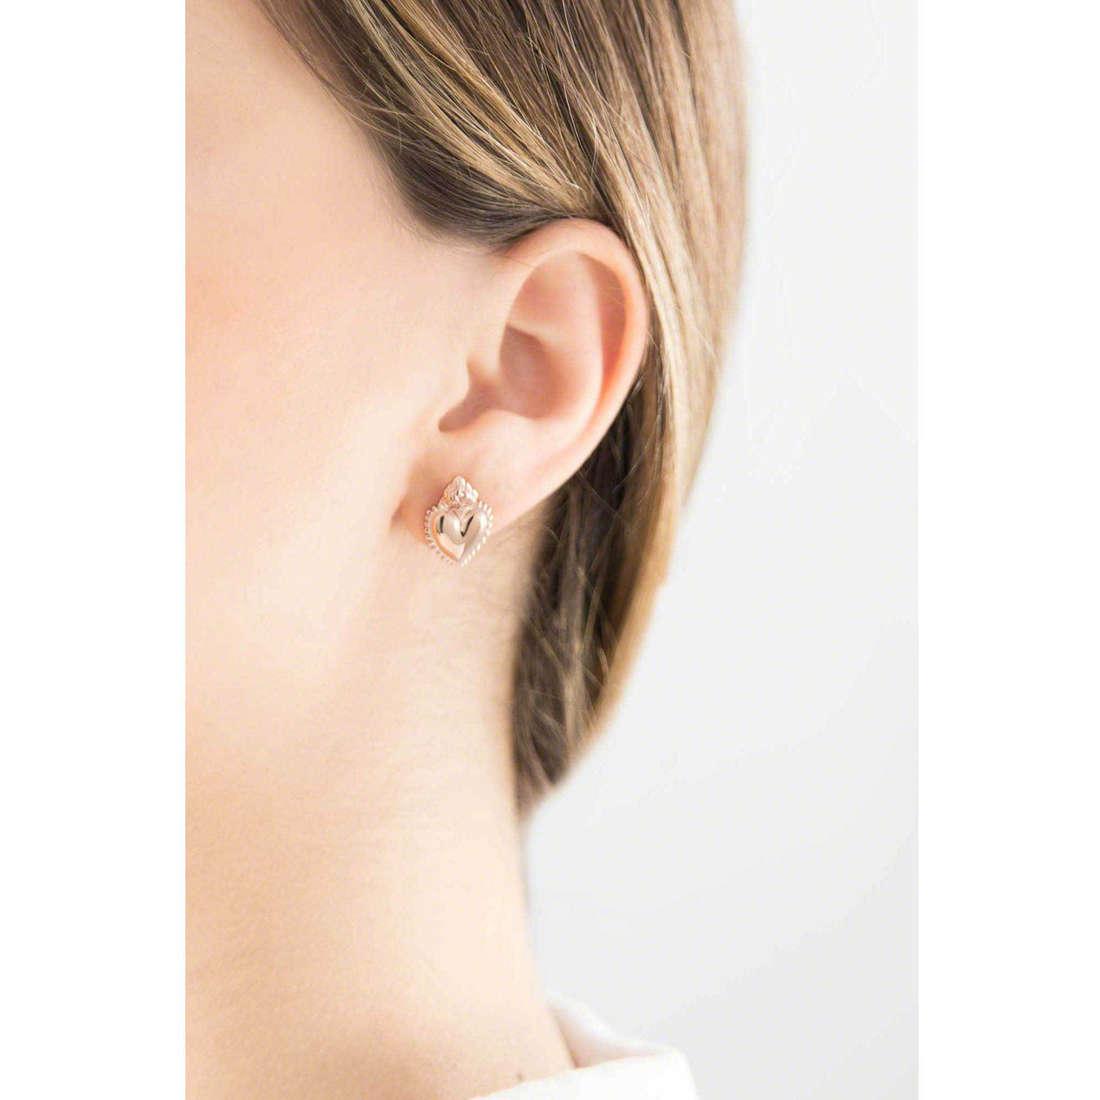 Marlù boucles d'oreille Sacro Cuore femme 13OR010 indosso